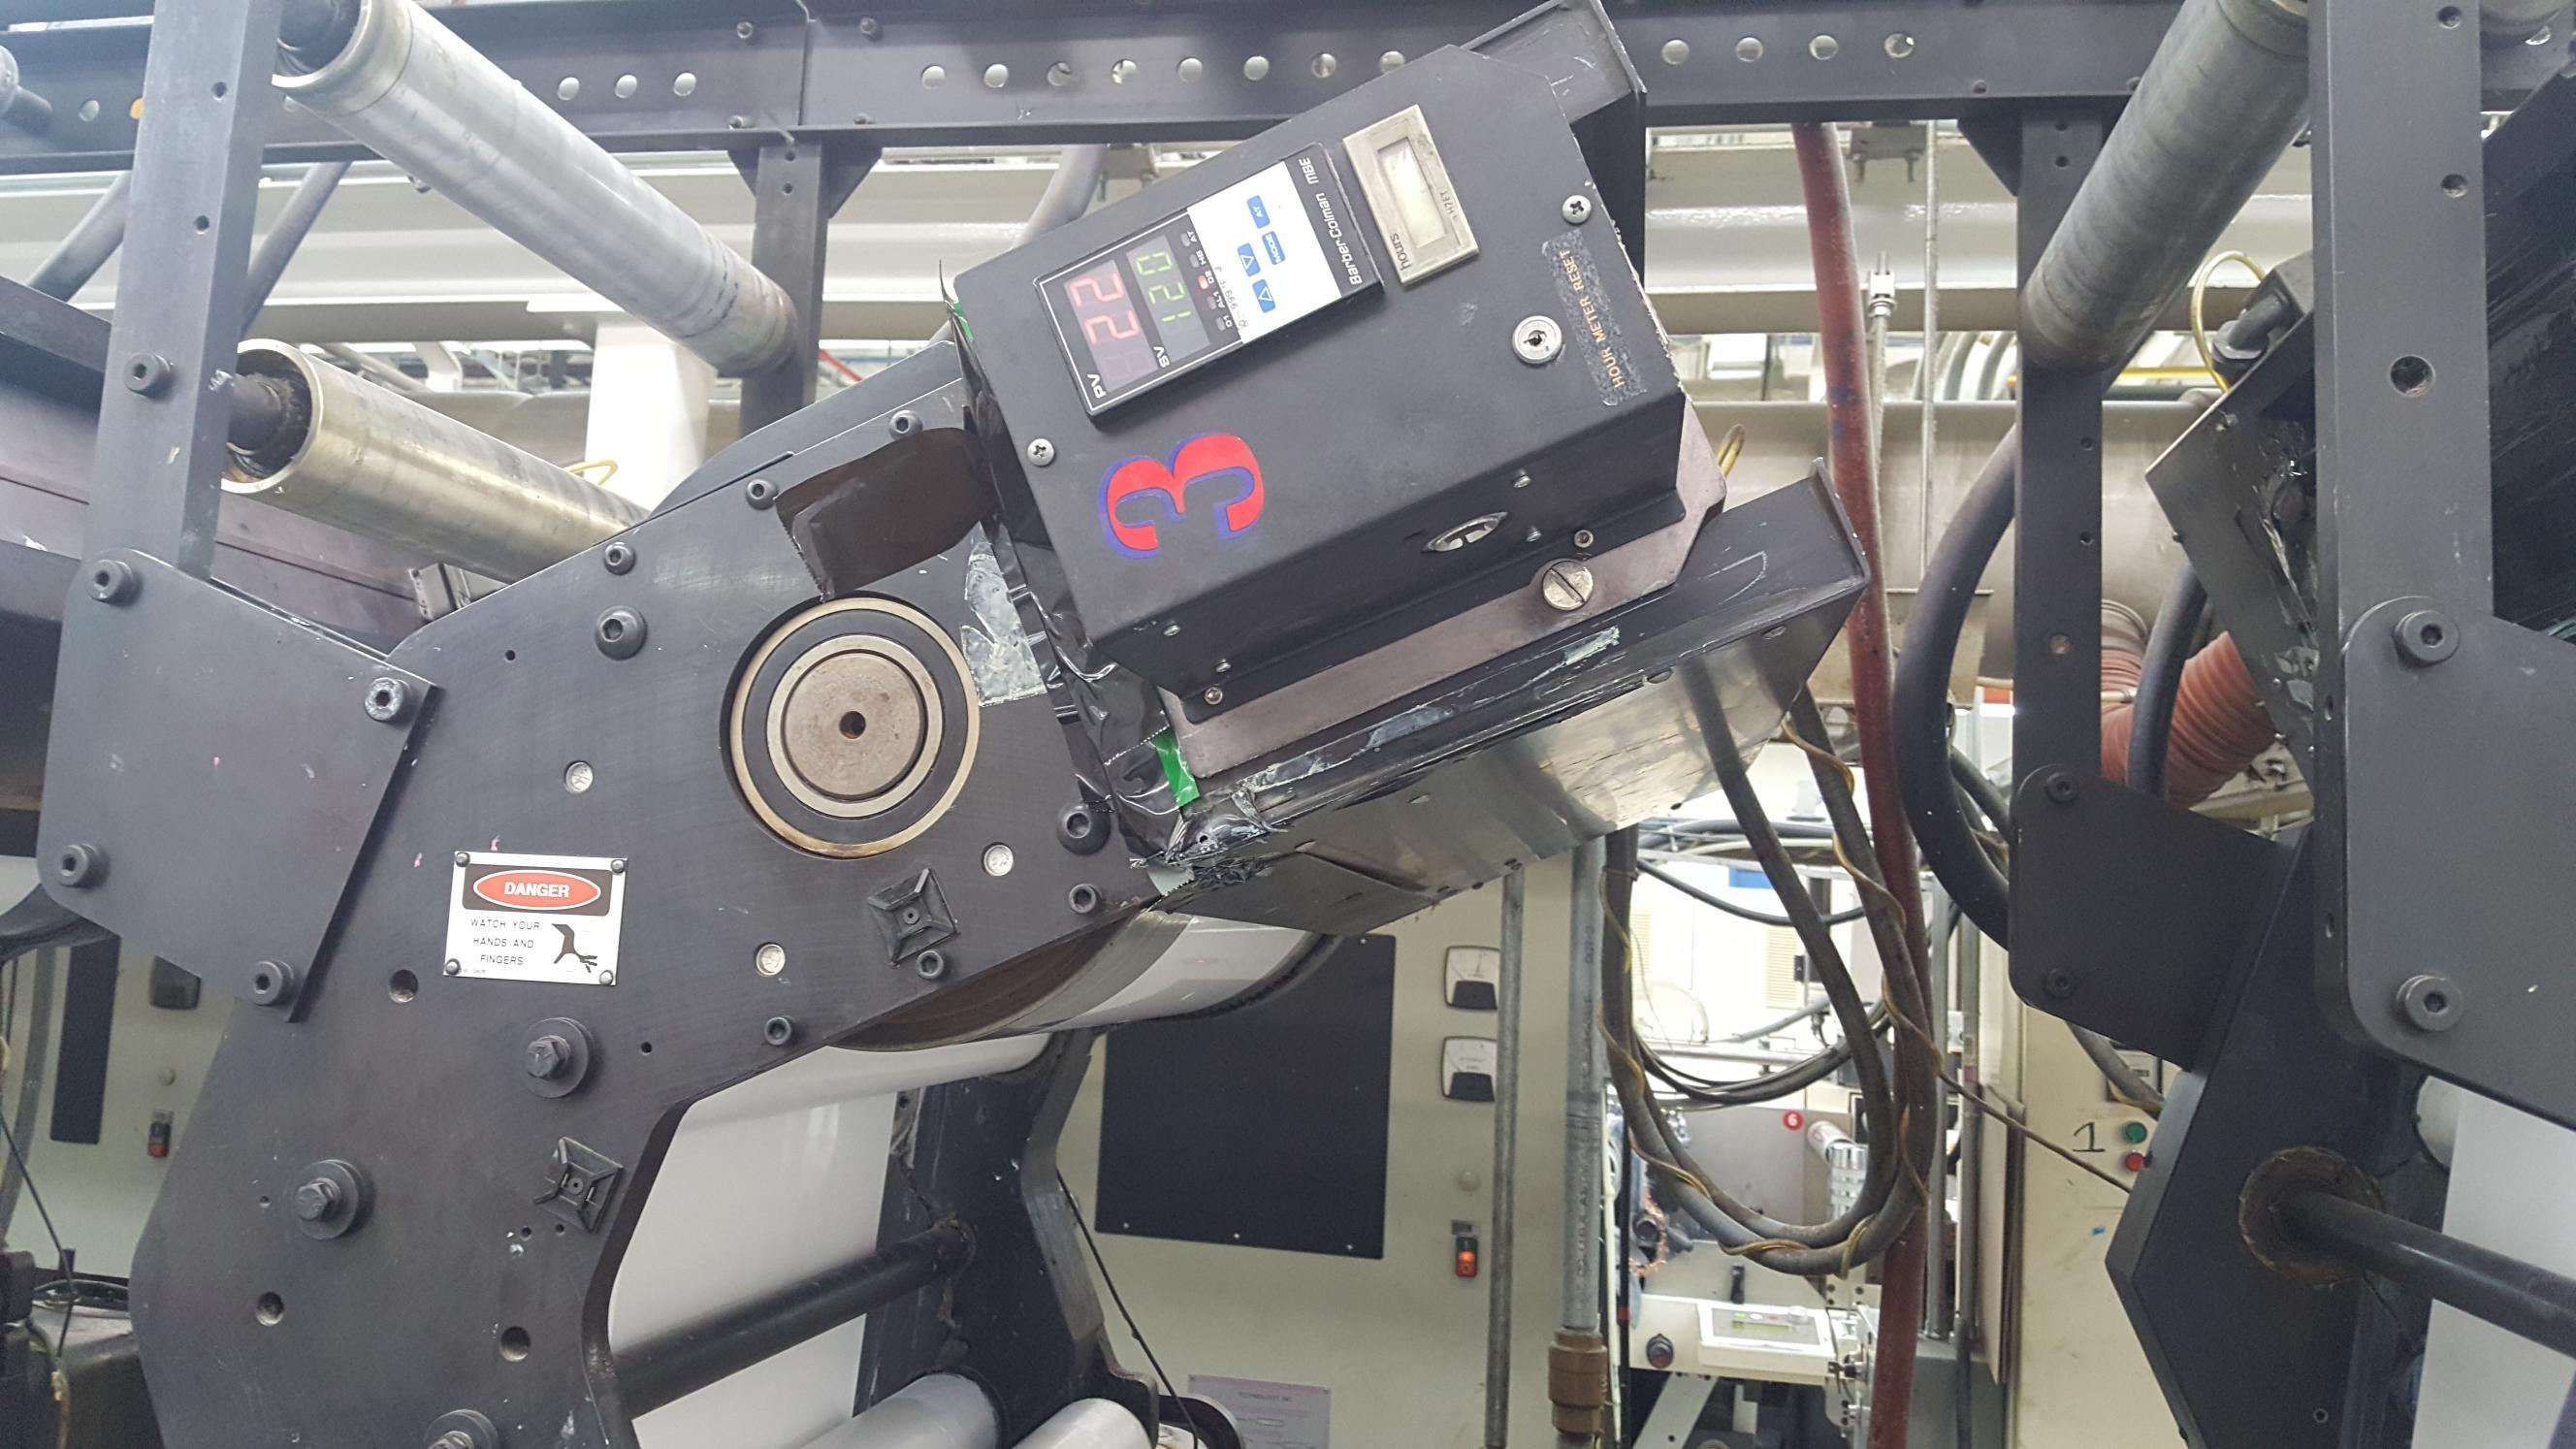 Comco ProGlide - Used Flexo Printing Presses and Used Flexographic Equipment-4